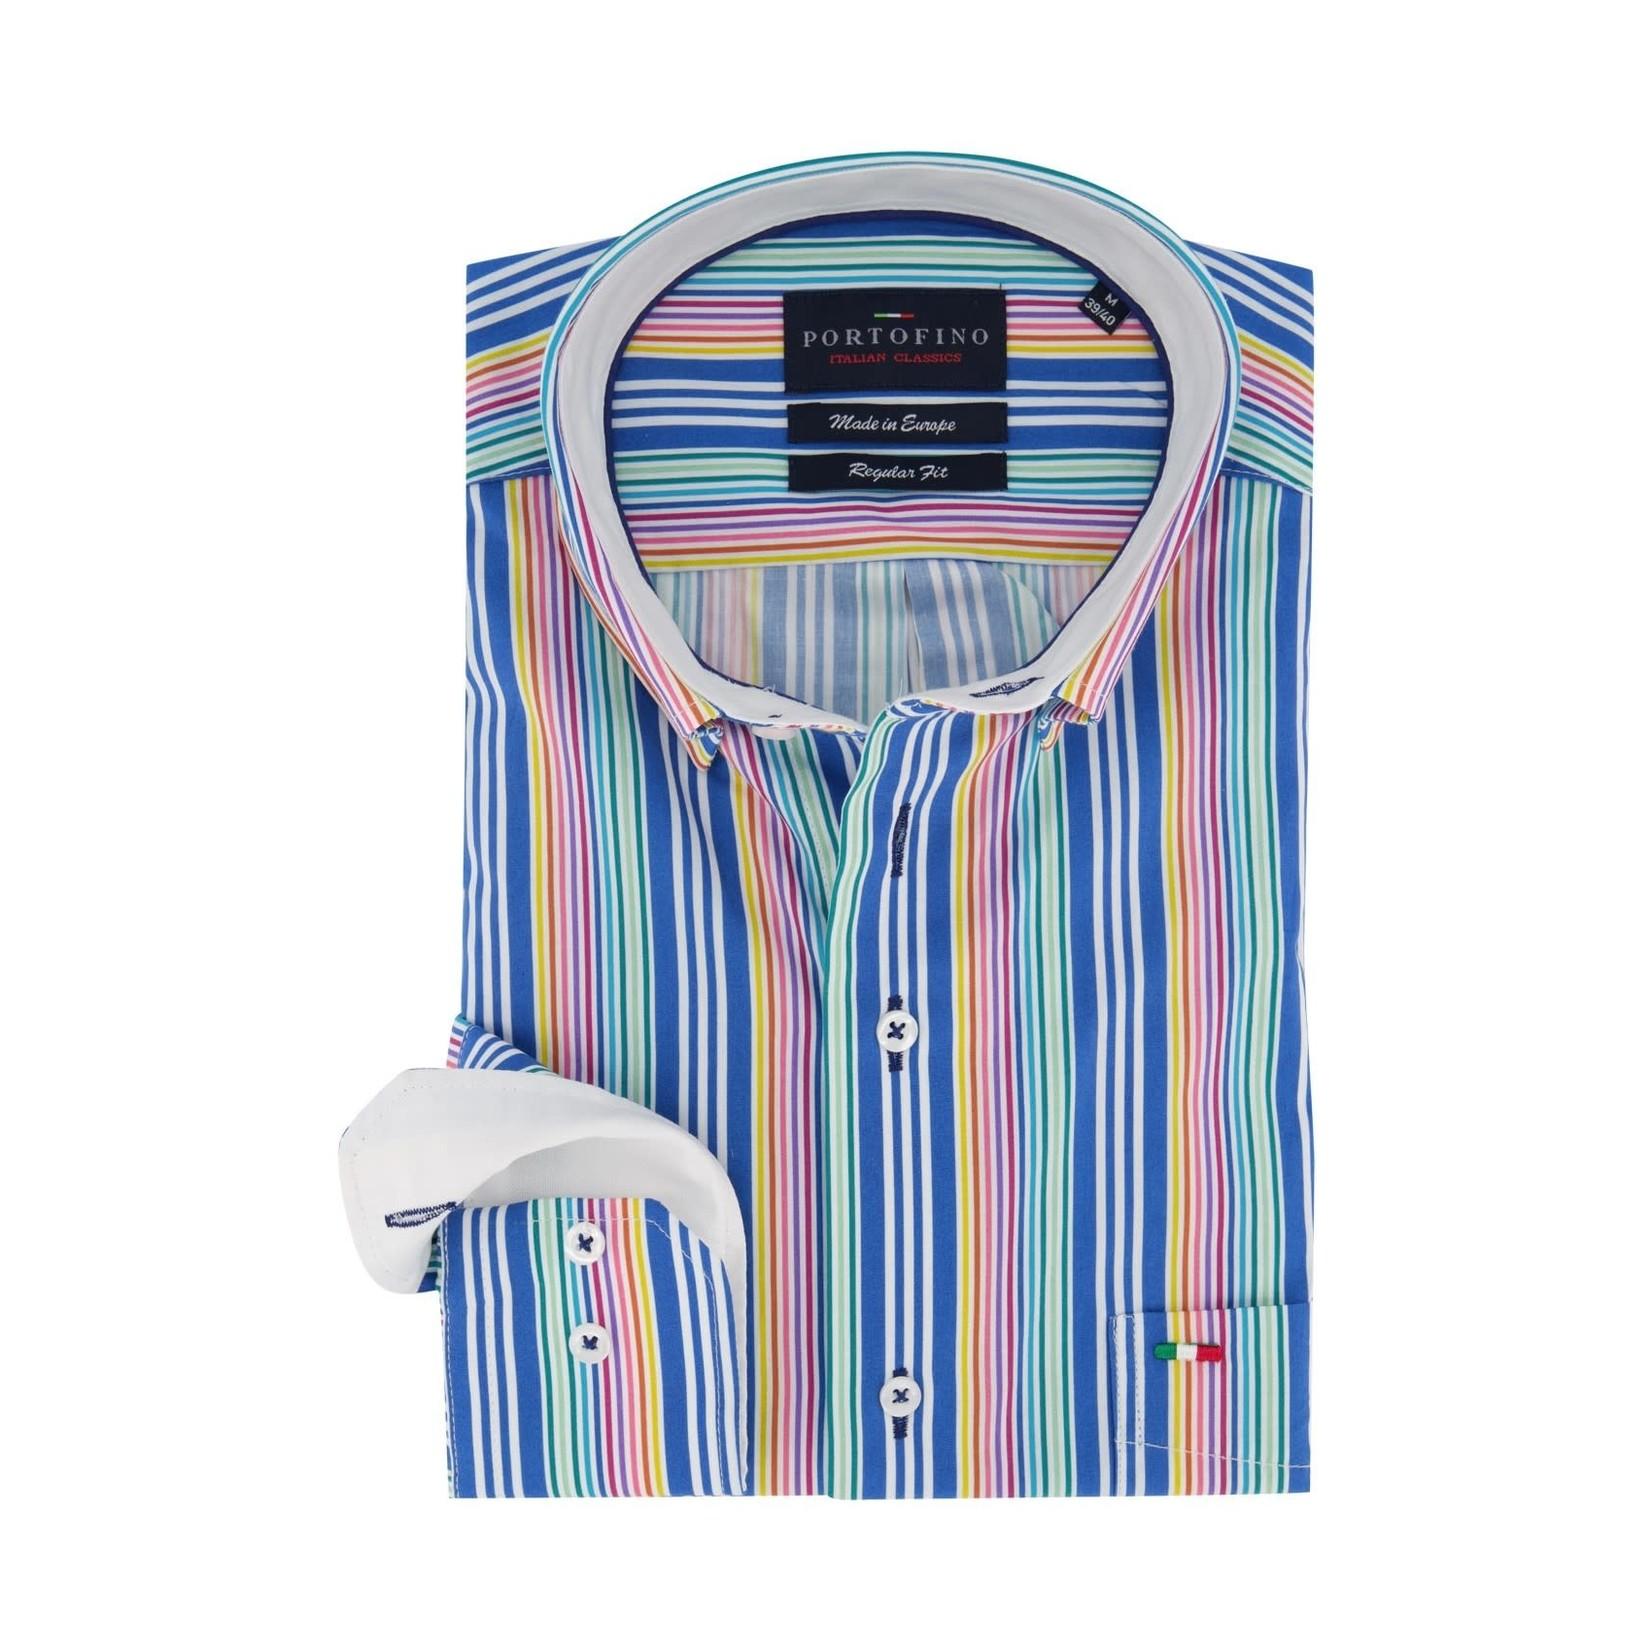 Portofino regular overhemd multi streep